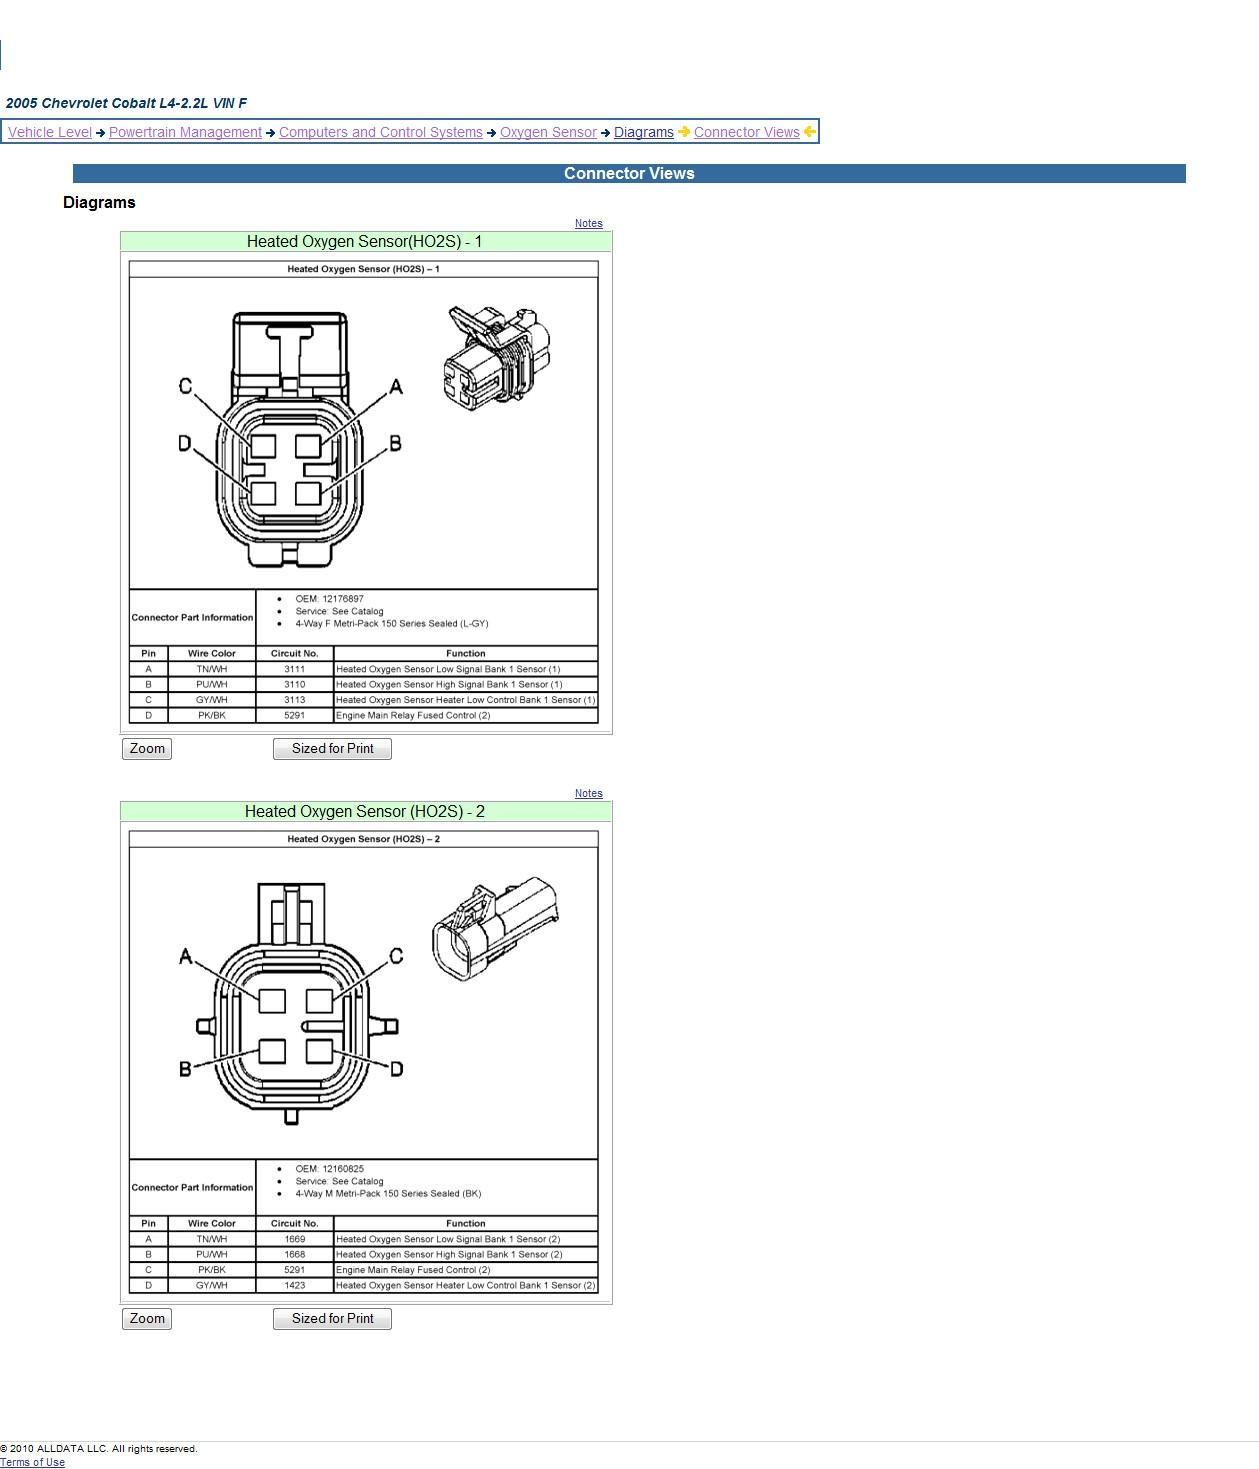 07 Chevy Silverado 02 Sensor Wiring Diagram | Wiring Diagram on